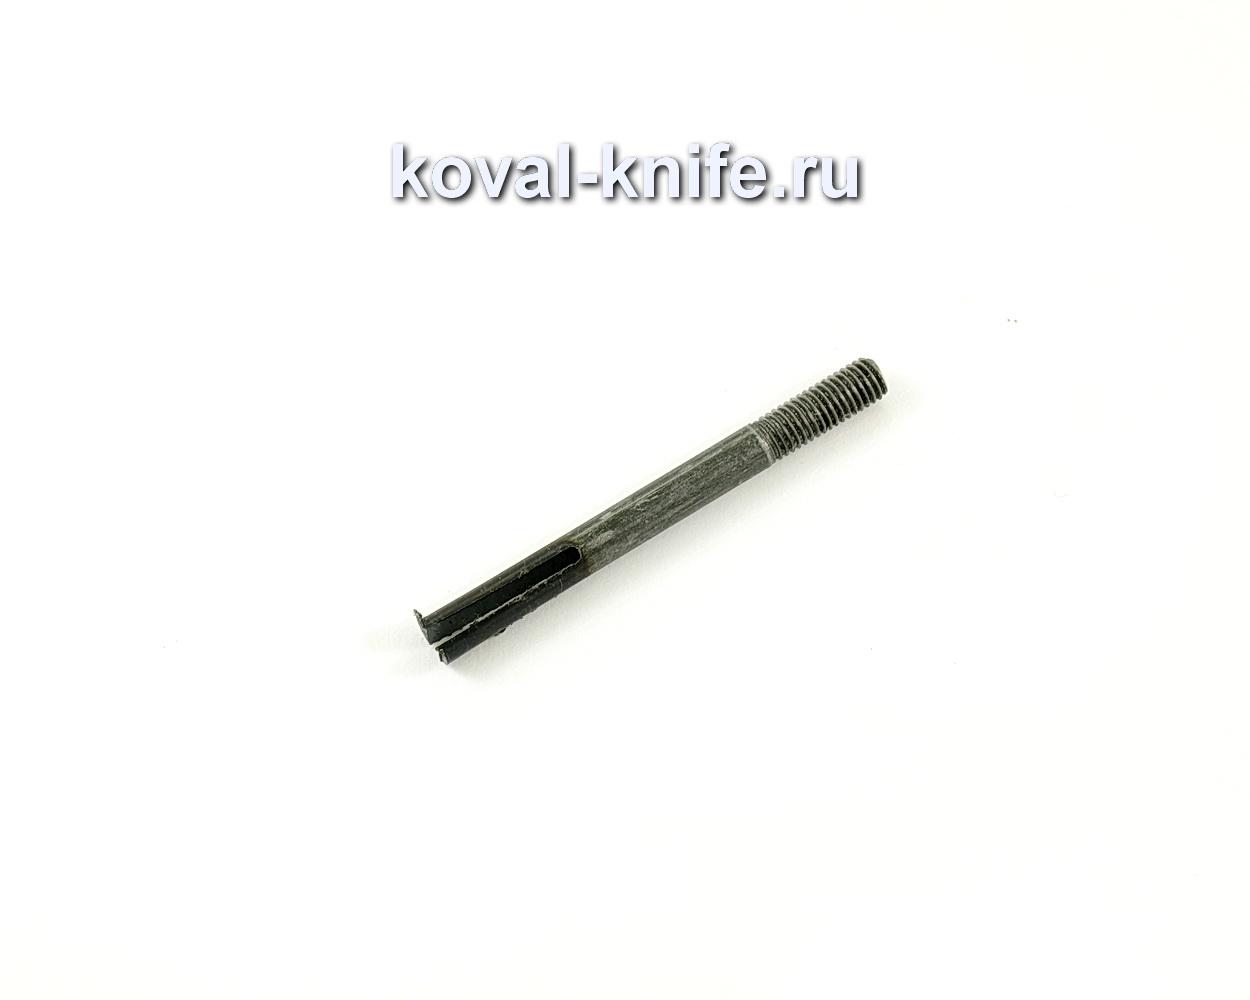 Шпилька для монтажа клинка с прорезью (d8мм.)